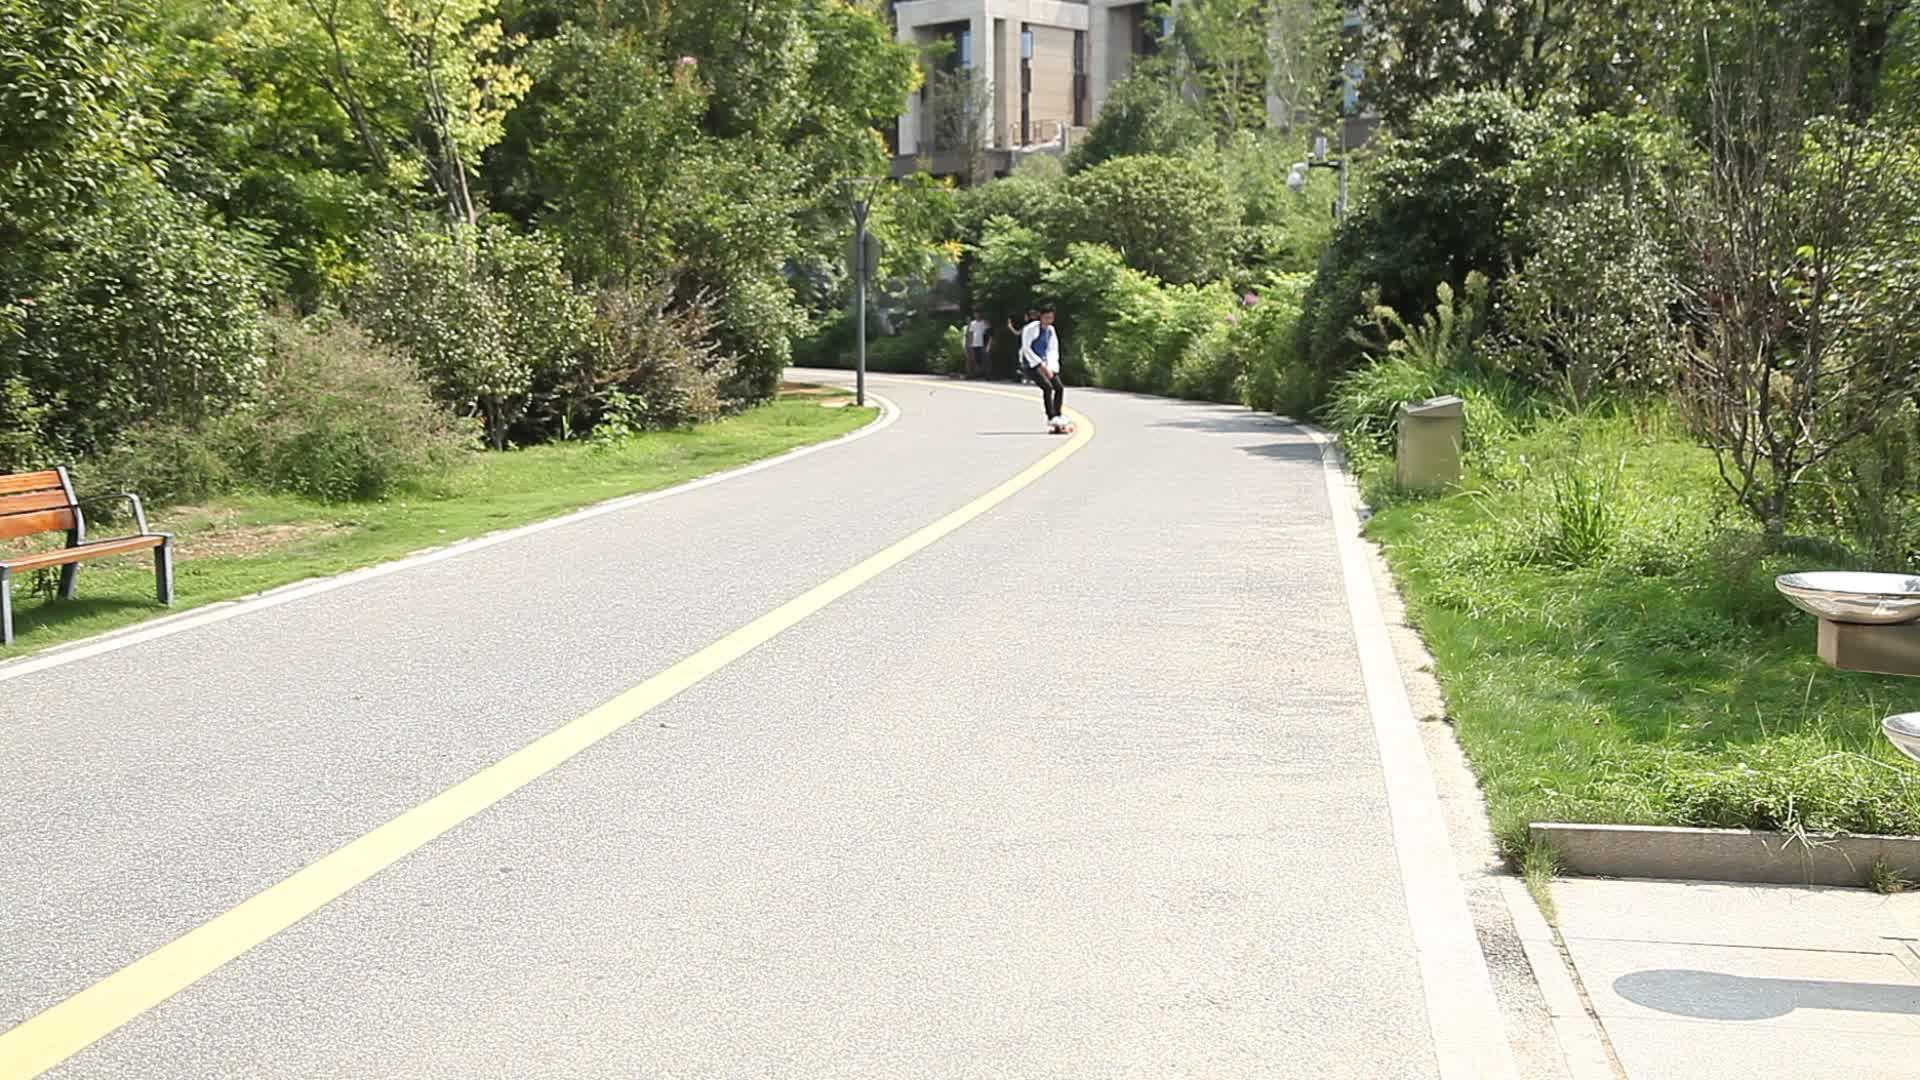 Doppel Kick Schwanz 100 Kanadischen Ahorn holz Skateboards komplette